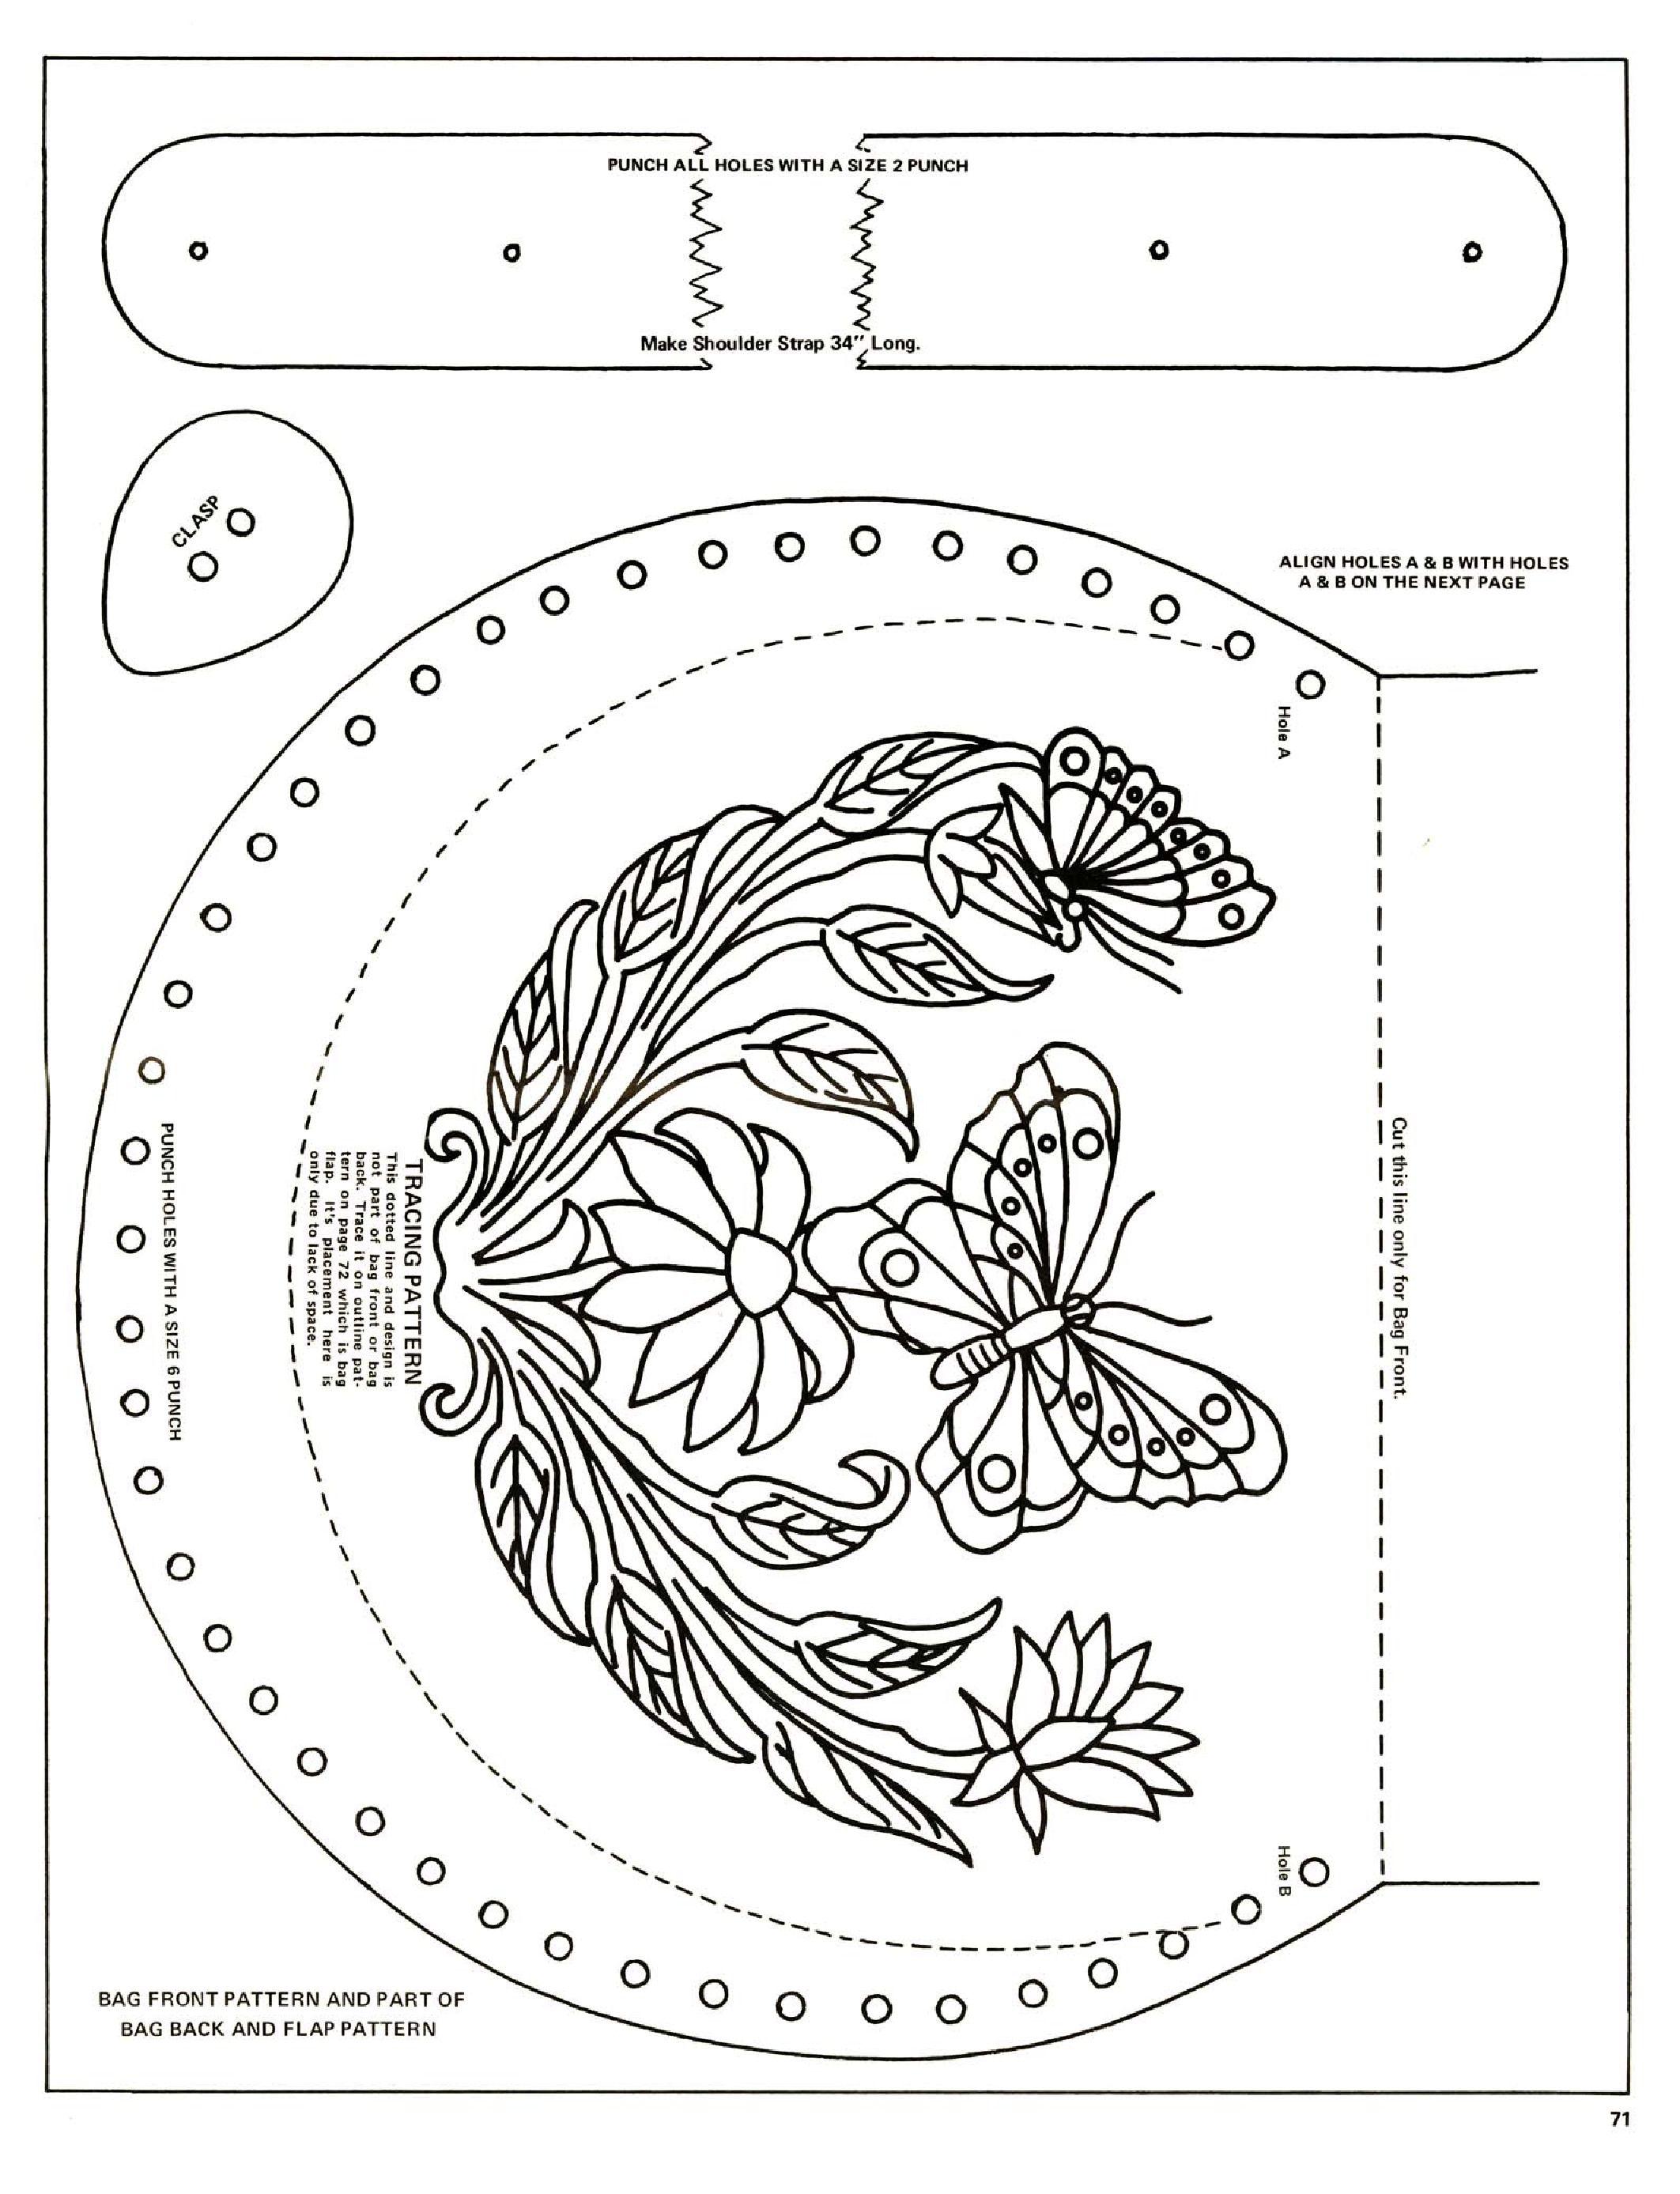 Pin on Patterns, Templates, Tutorials